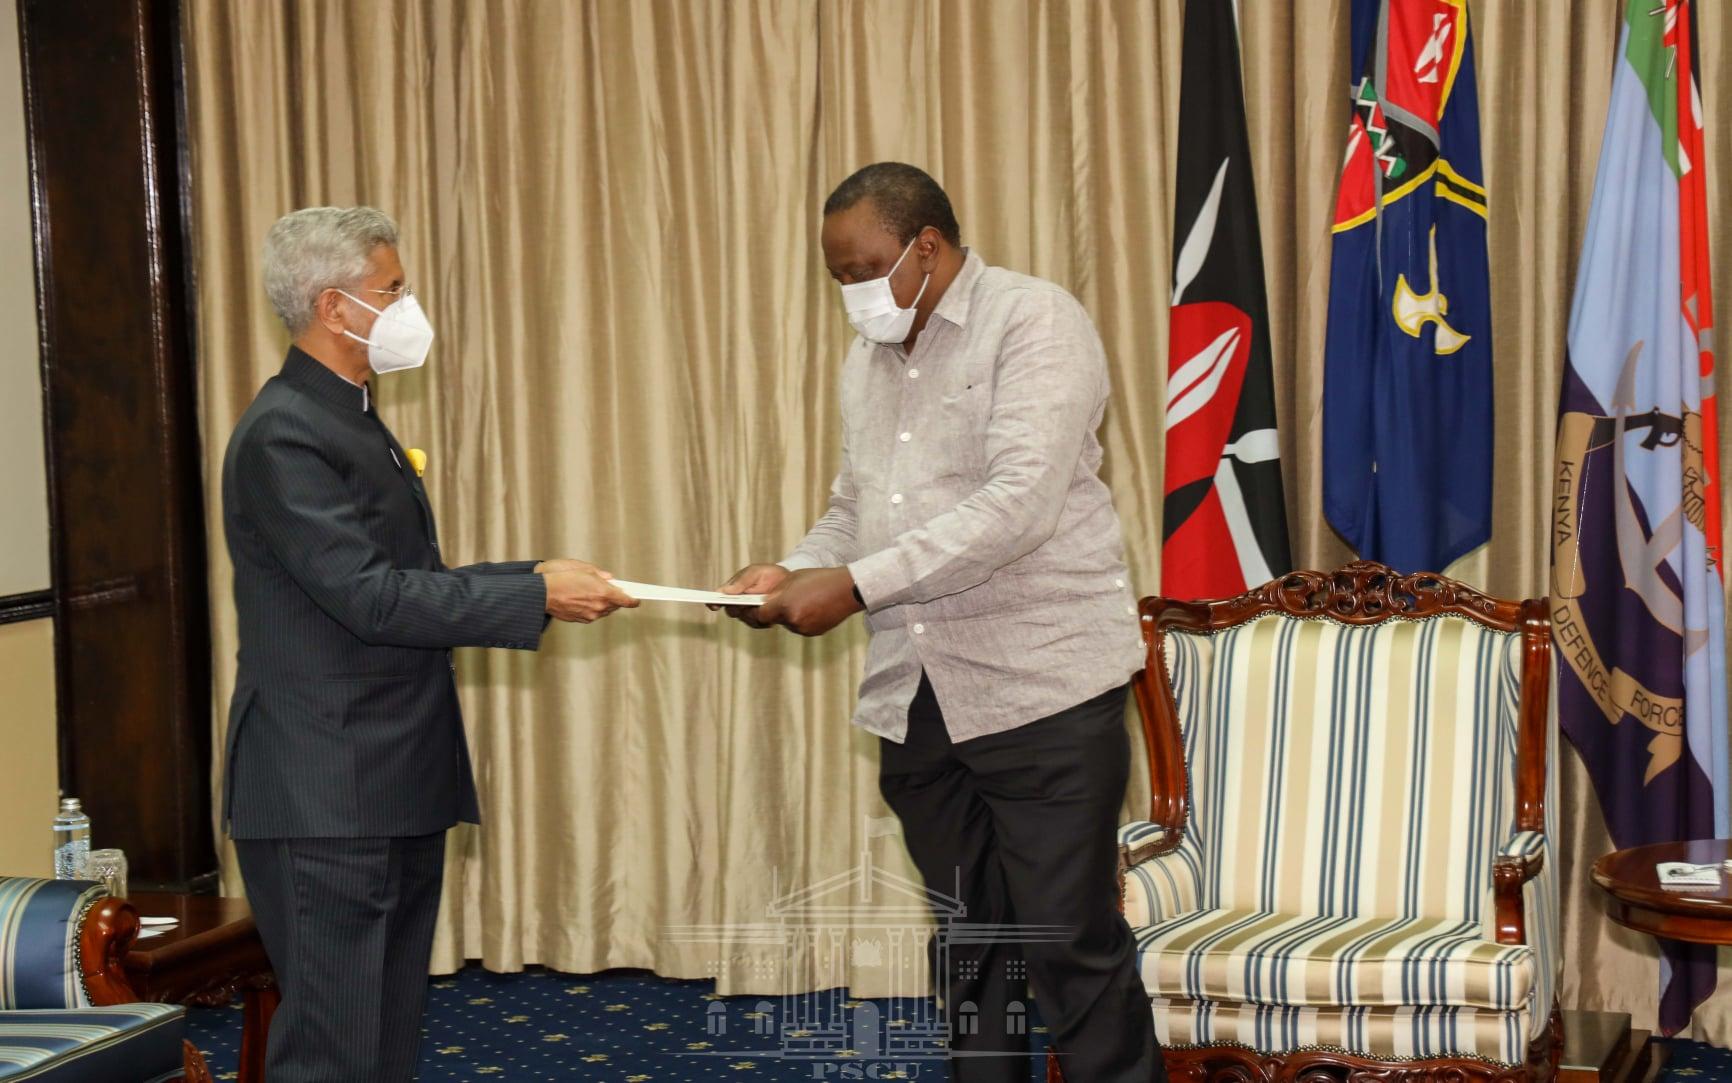 Let us unite for our Country's progress, President Kenyatta urges leaders – The Informer